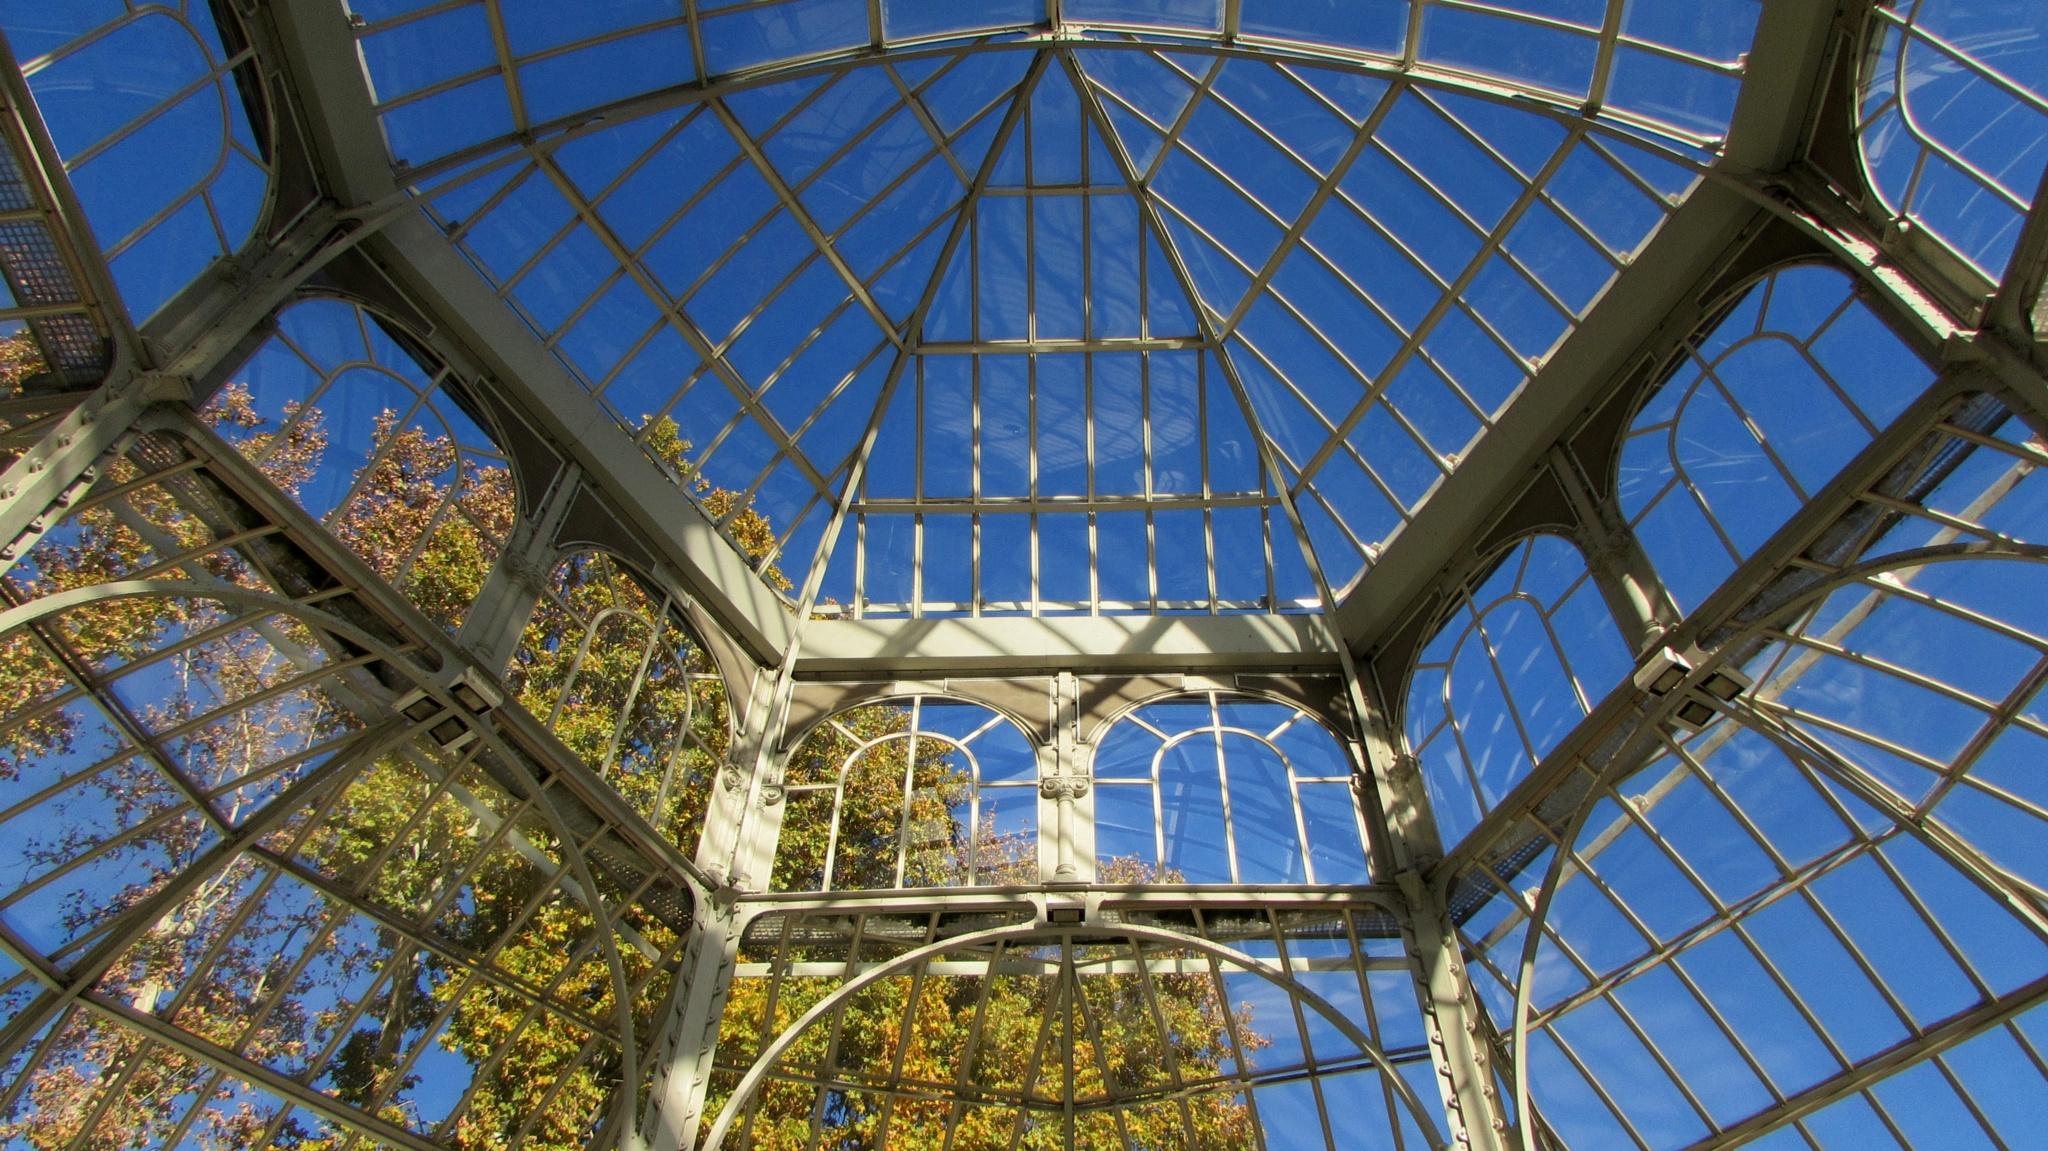 Crystal Palace by Isabel Gonzalez Martil